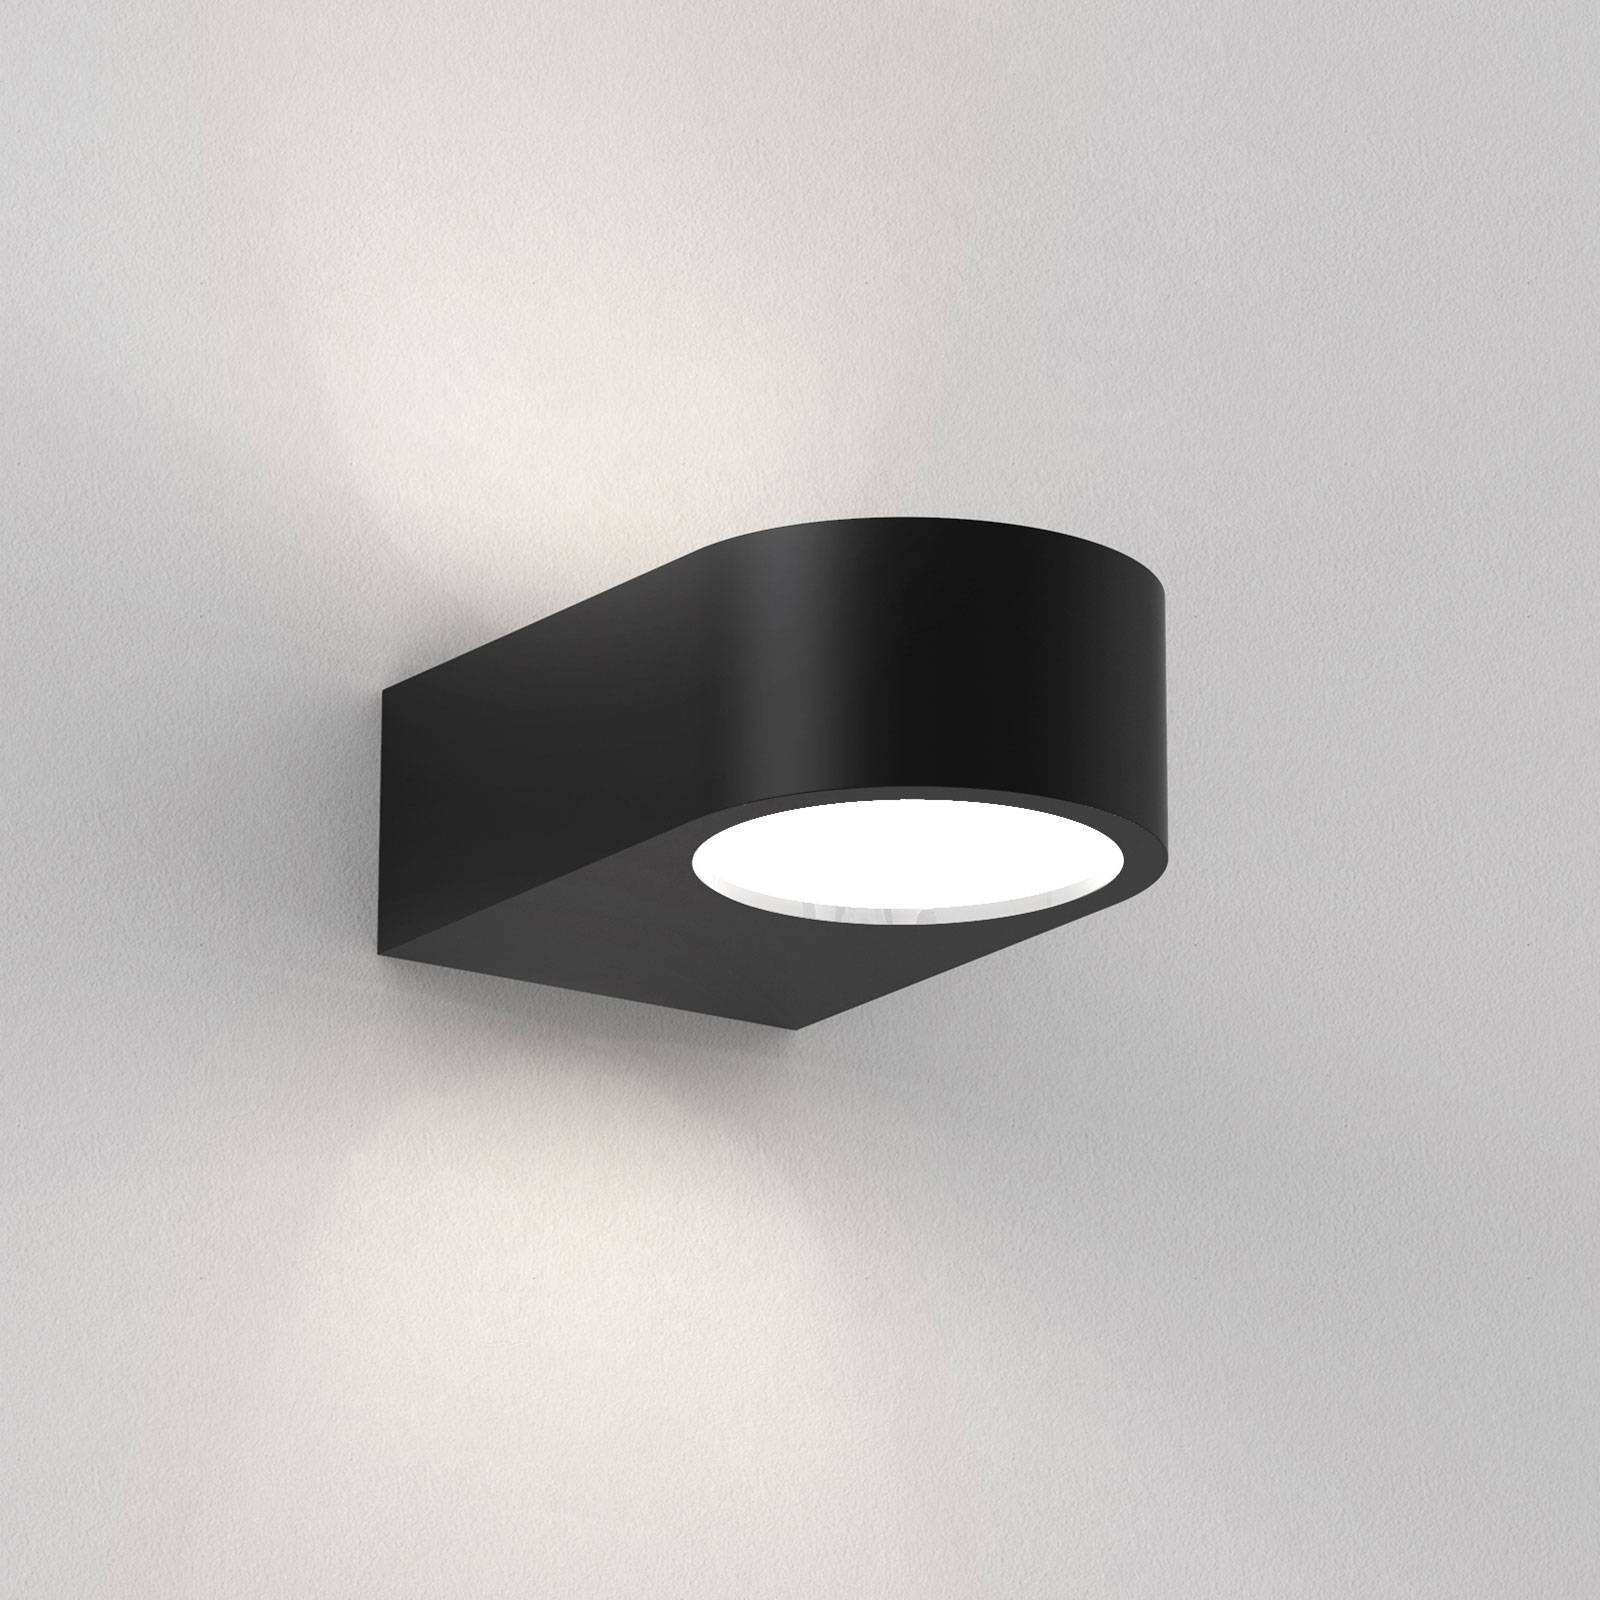 Astro Epsilon LED-Wandleuchte up & down, schwarz